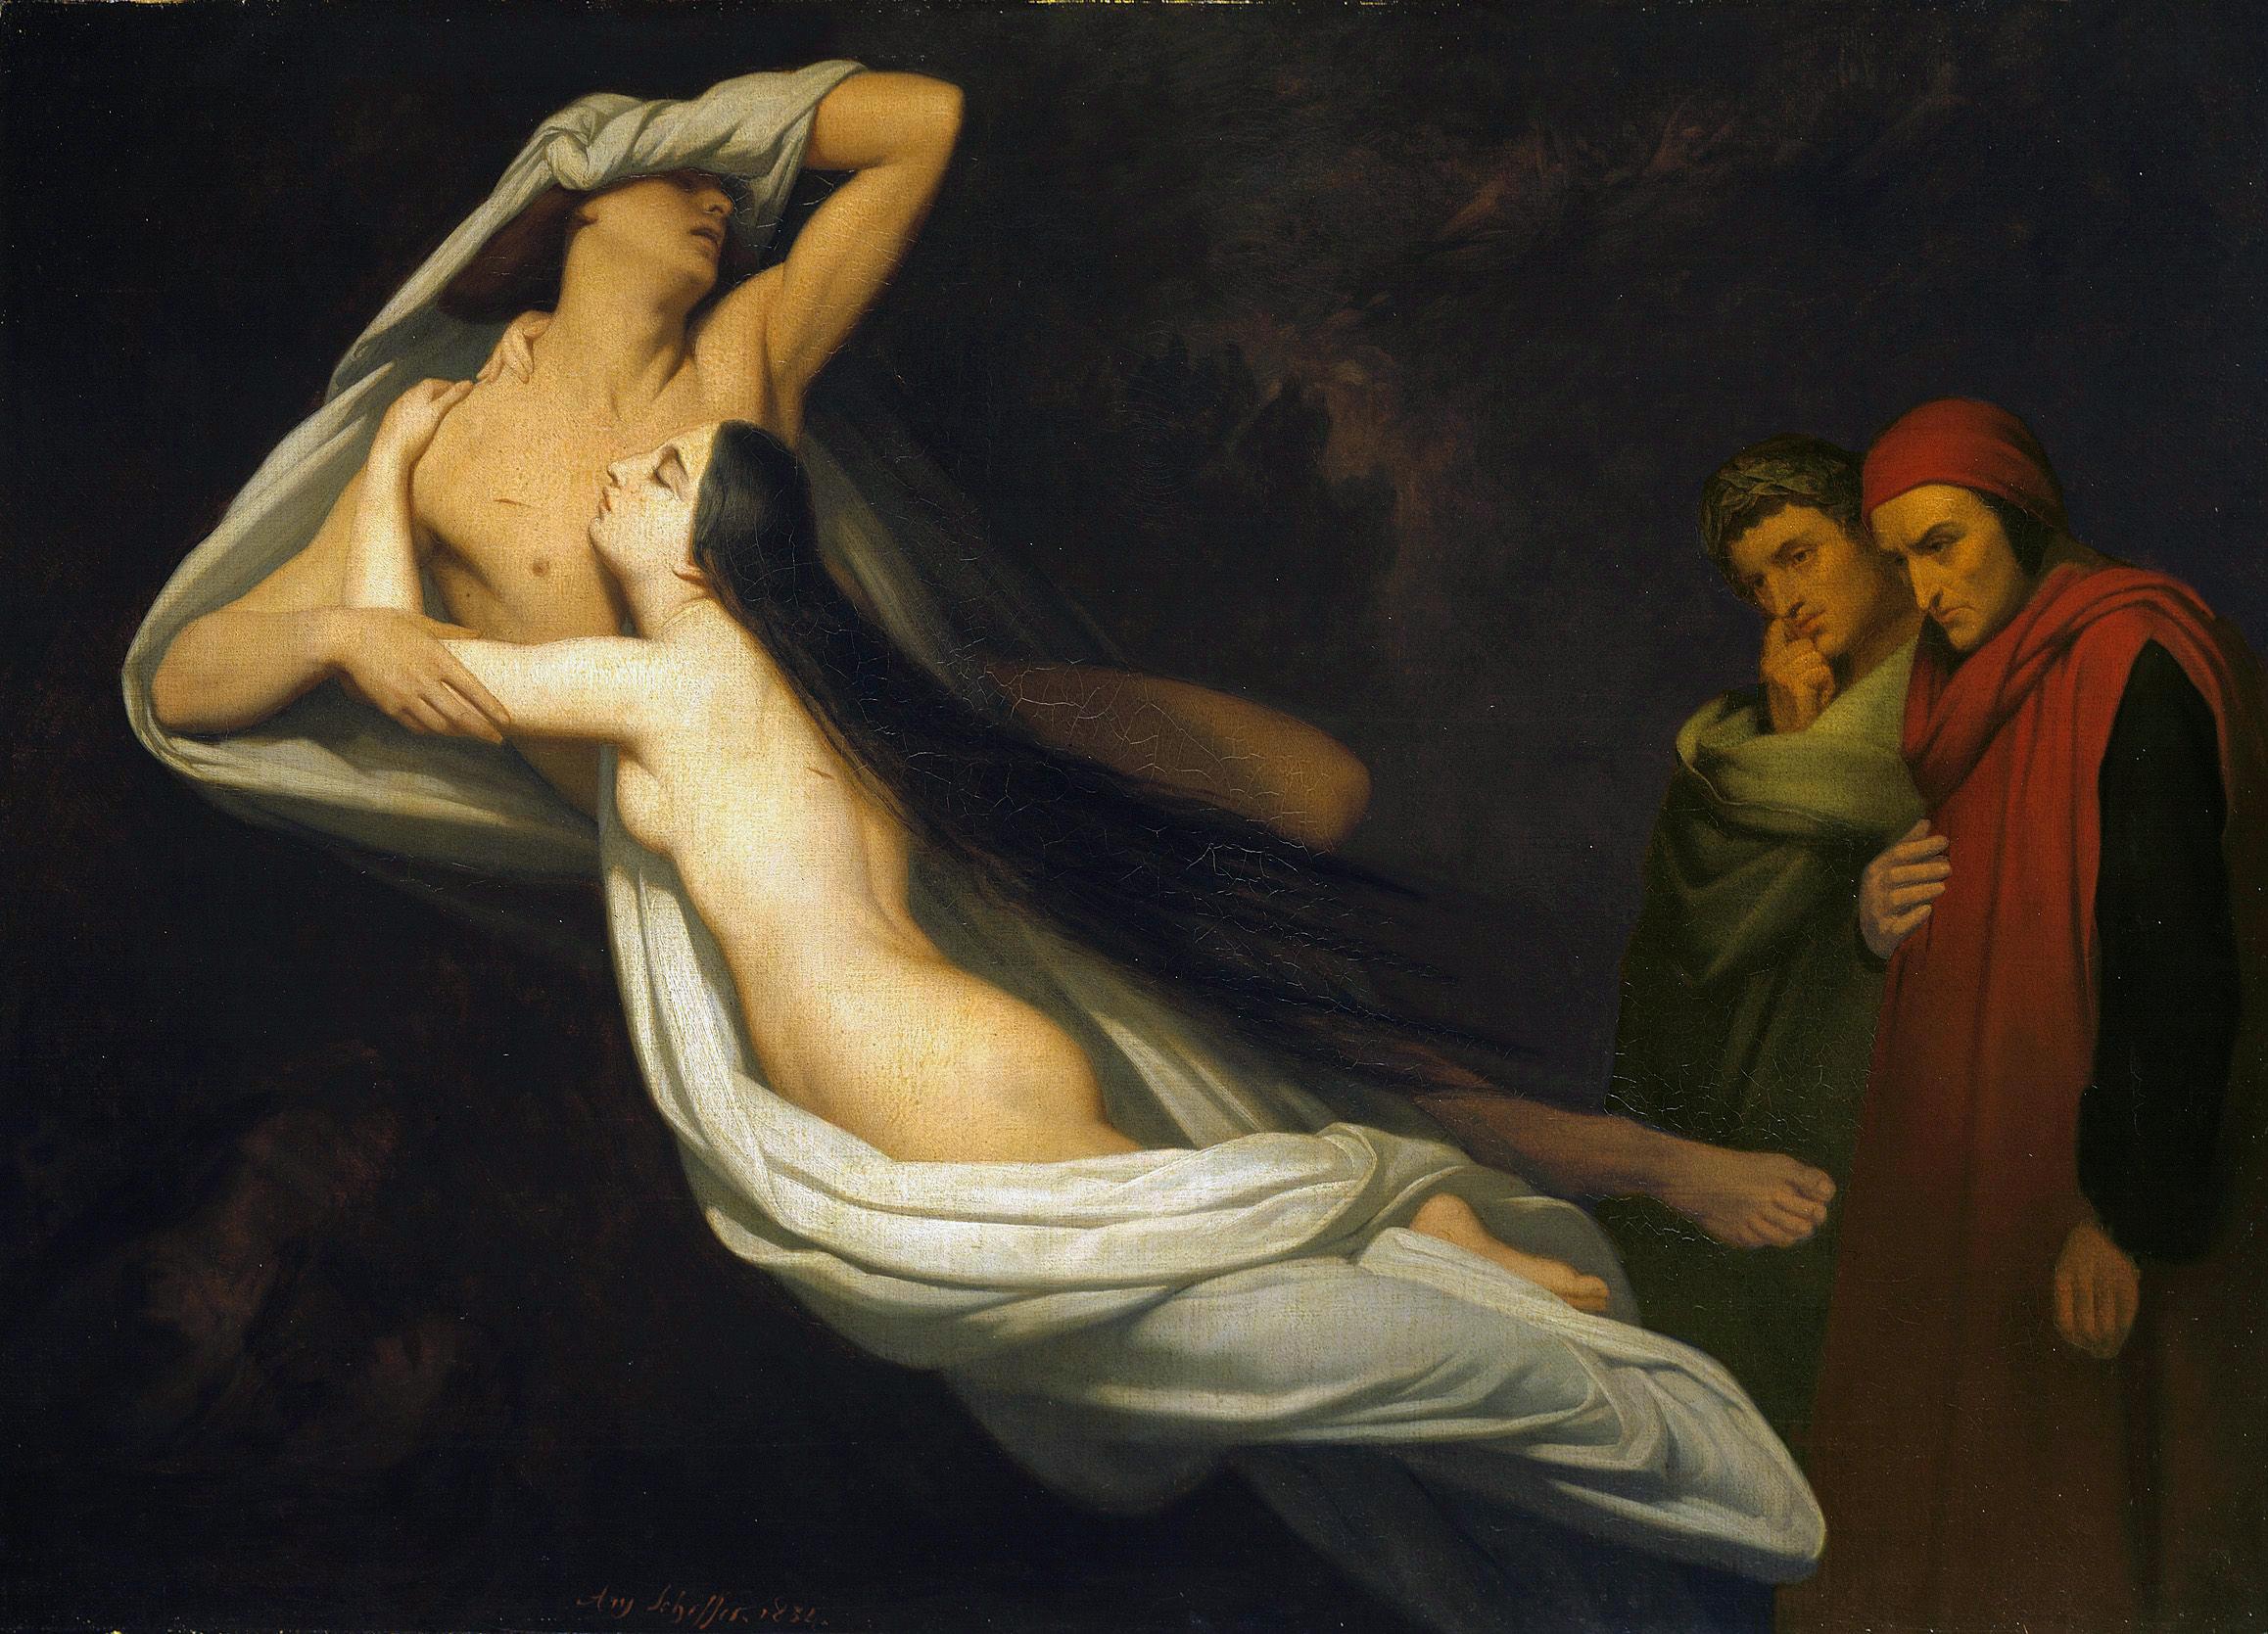 Ary Scheffer - Paolo et Francesca